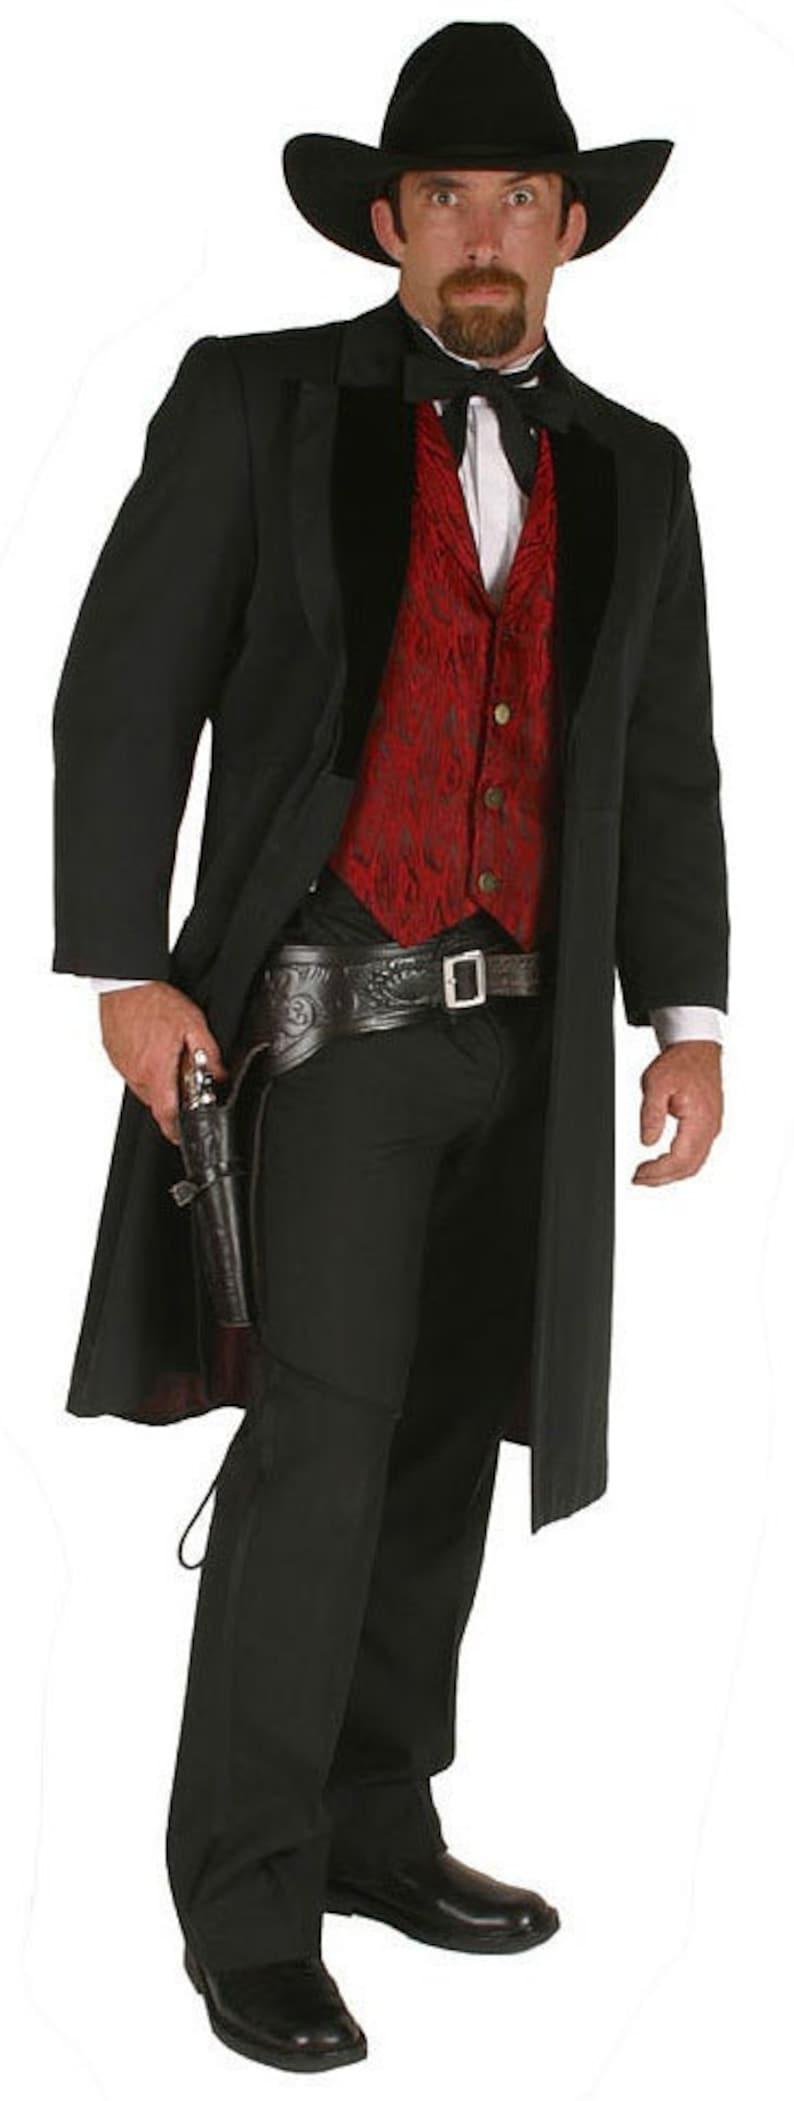 Victorian Men's Costumes: Mad Hatter, Rhet Butler, Willy Wonka John (Doc) Holliday Tombstone Western Costume $268.97 AT vintagedancer.com